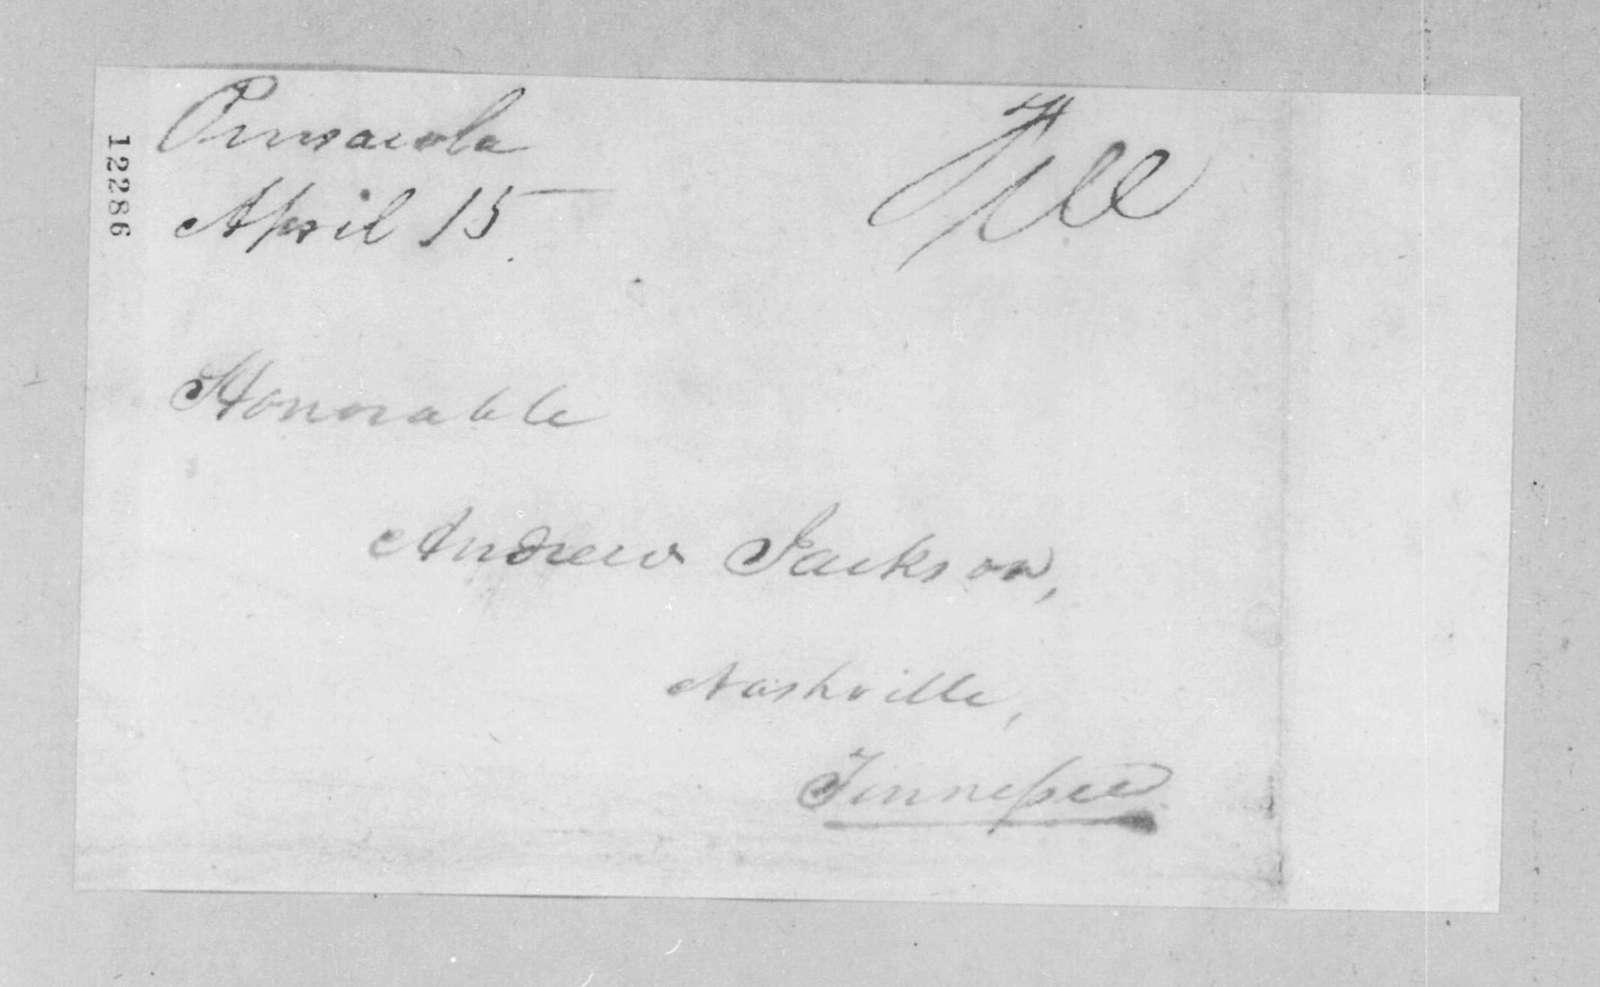 Joseph Philips et al. to Andrew Jackson, April 14, 1825